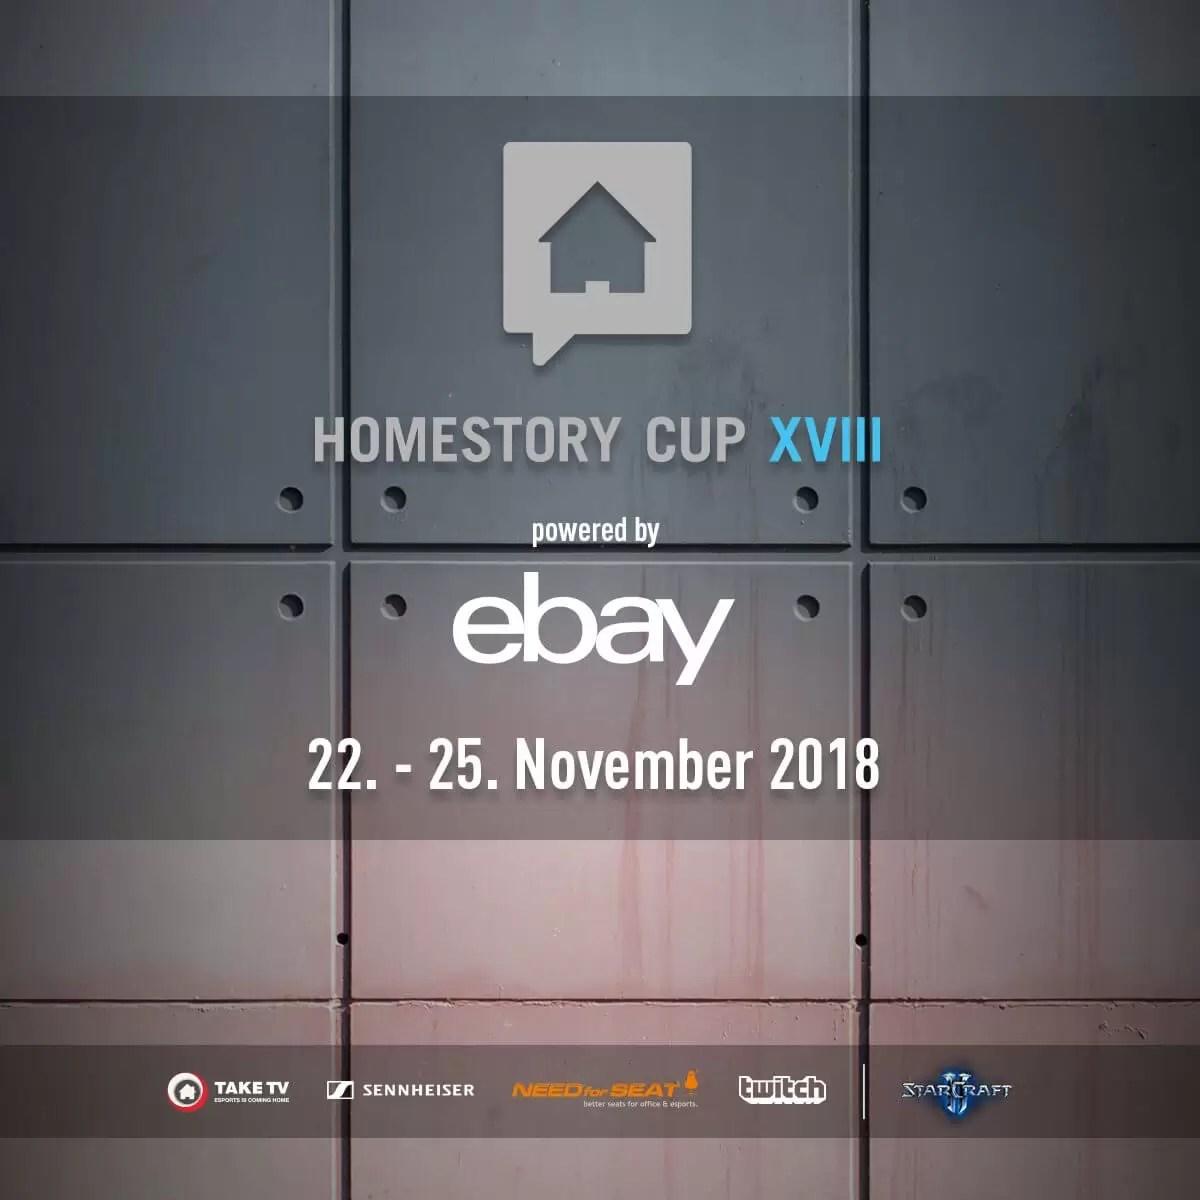 HomeStoryCup XVIII ima potvrđen datum i velikog novog sponzora – ebay!